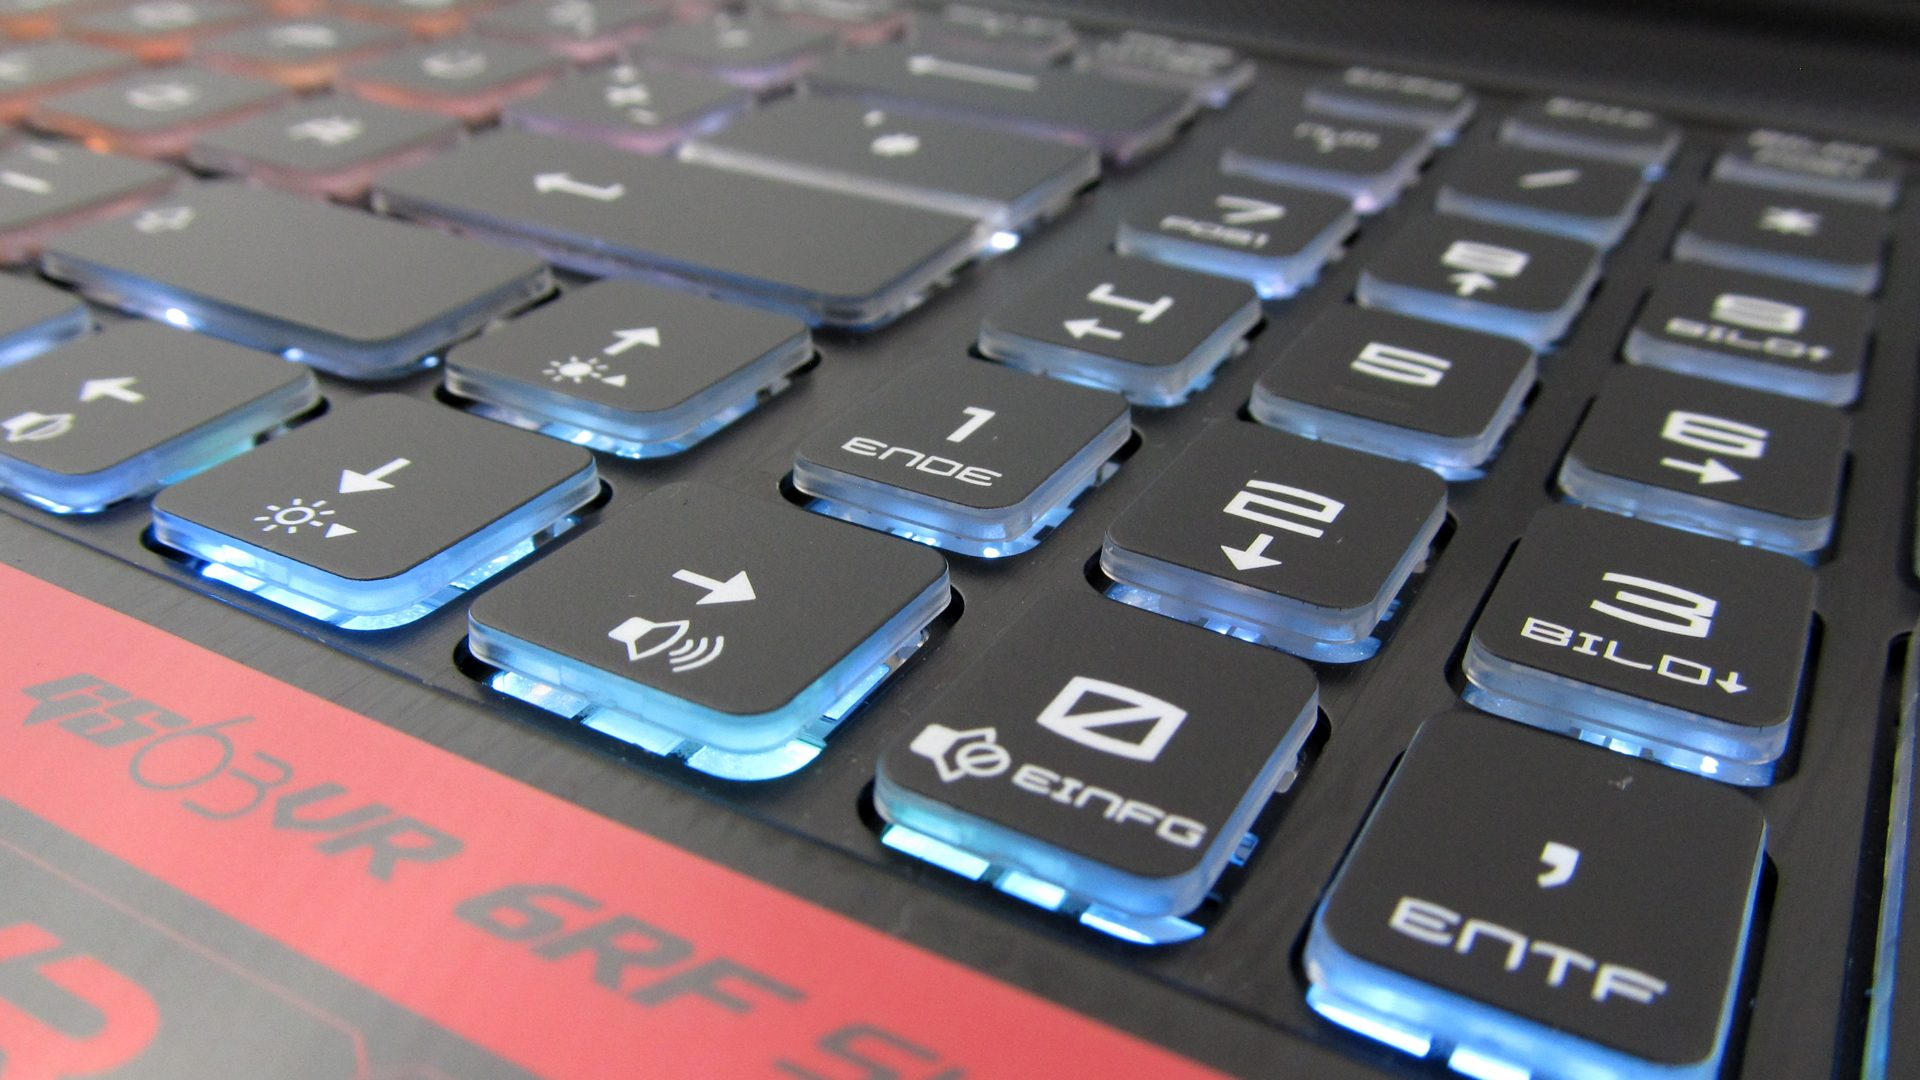 msi_gs63vr_tastatur_4